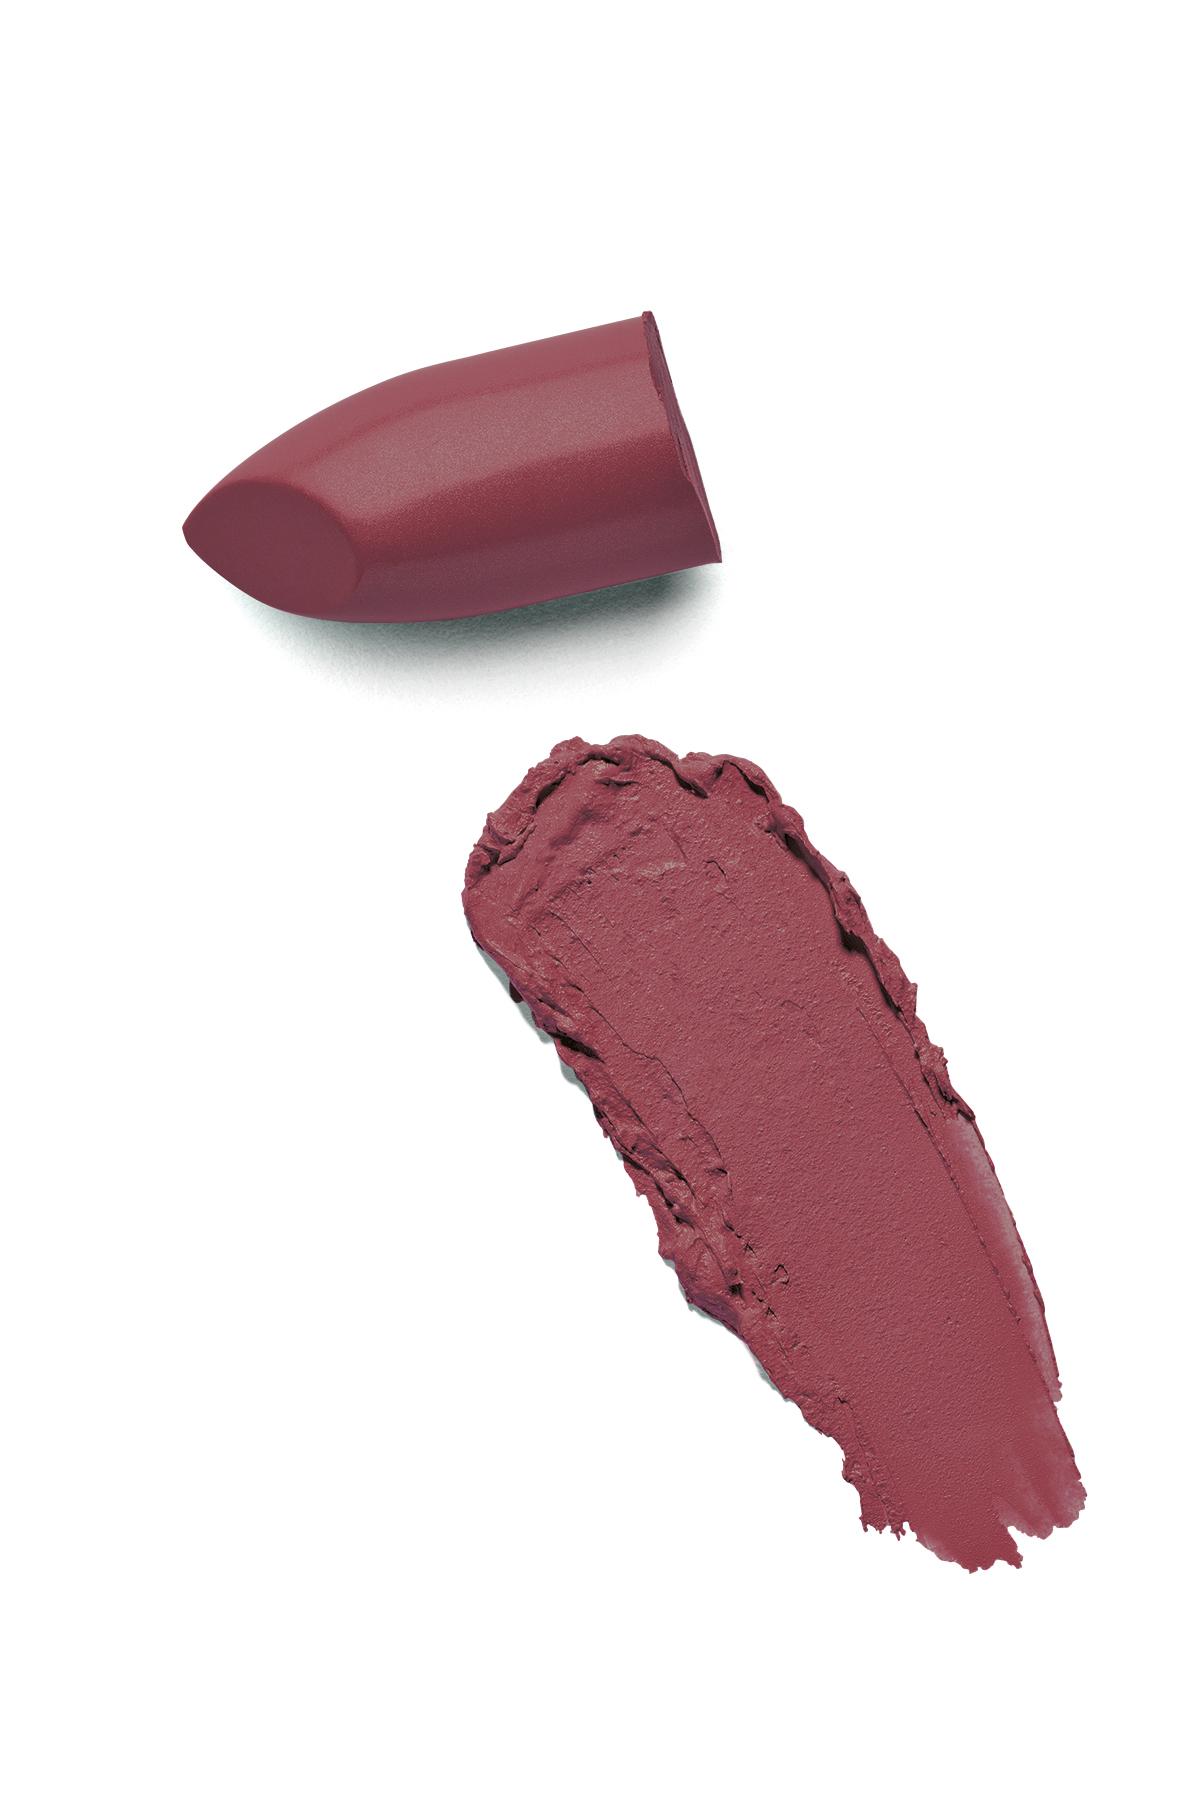 Matte Lipstick - 187 -Lipstick Thumbnail